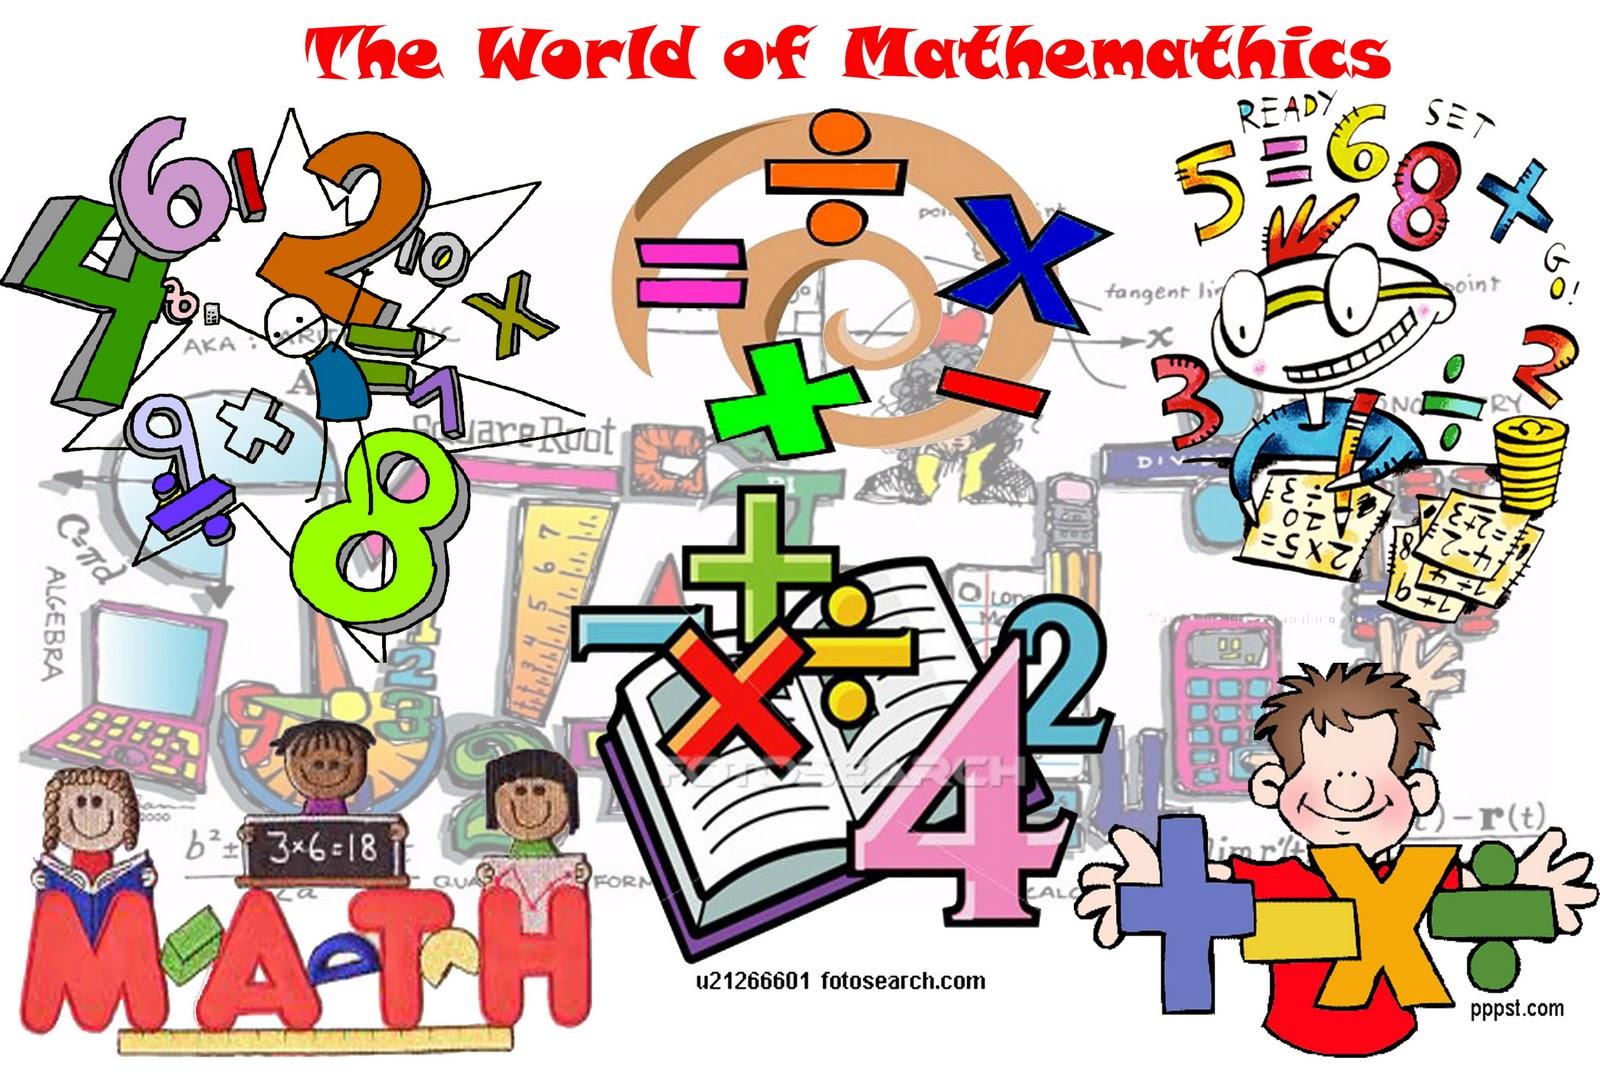 My Math portfolio